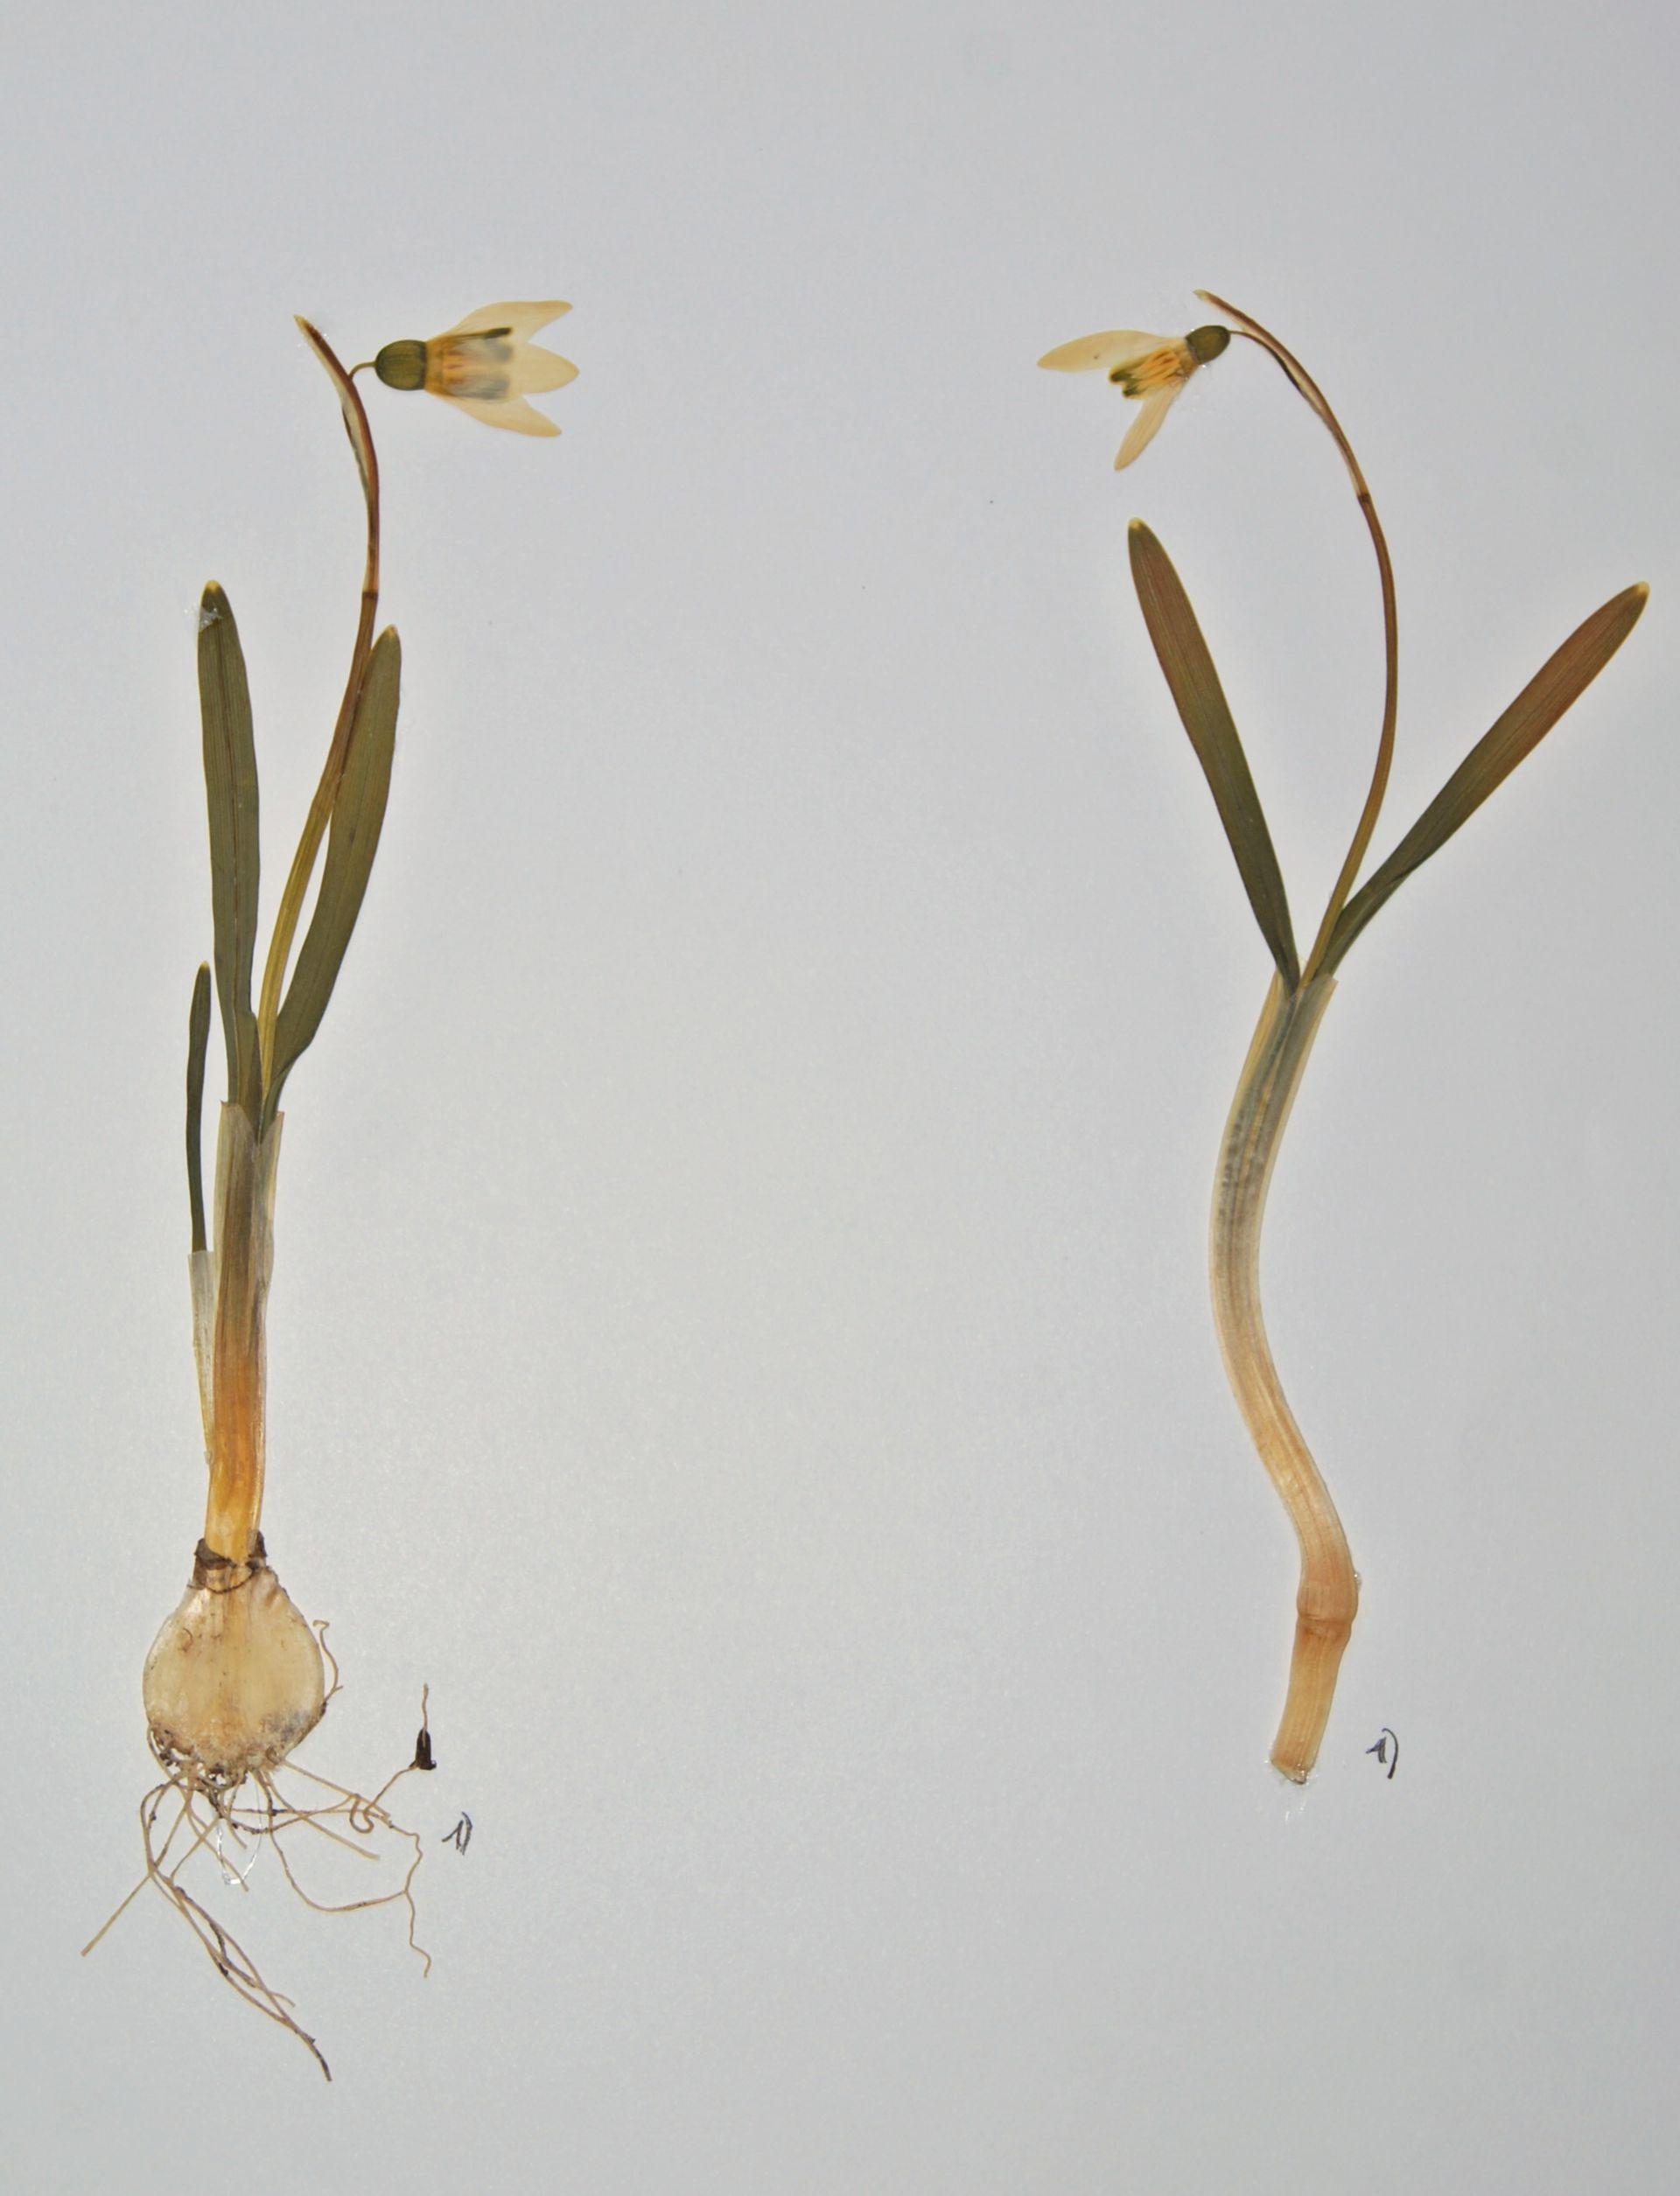 Galanthus nivalis - Herbarbeleg